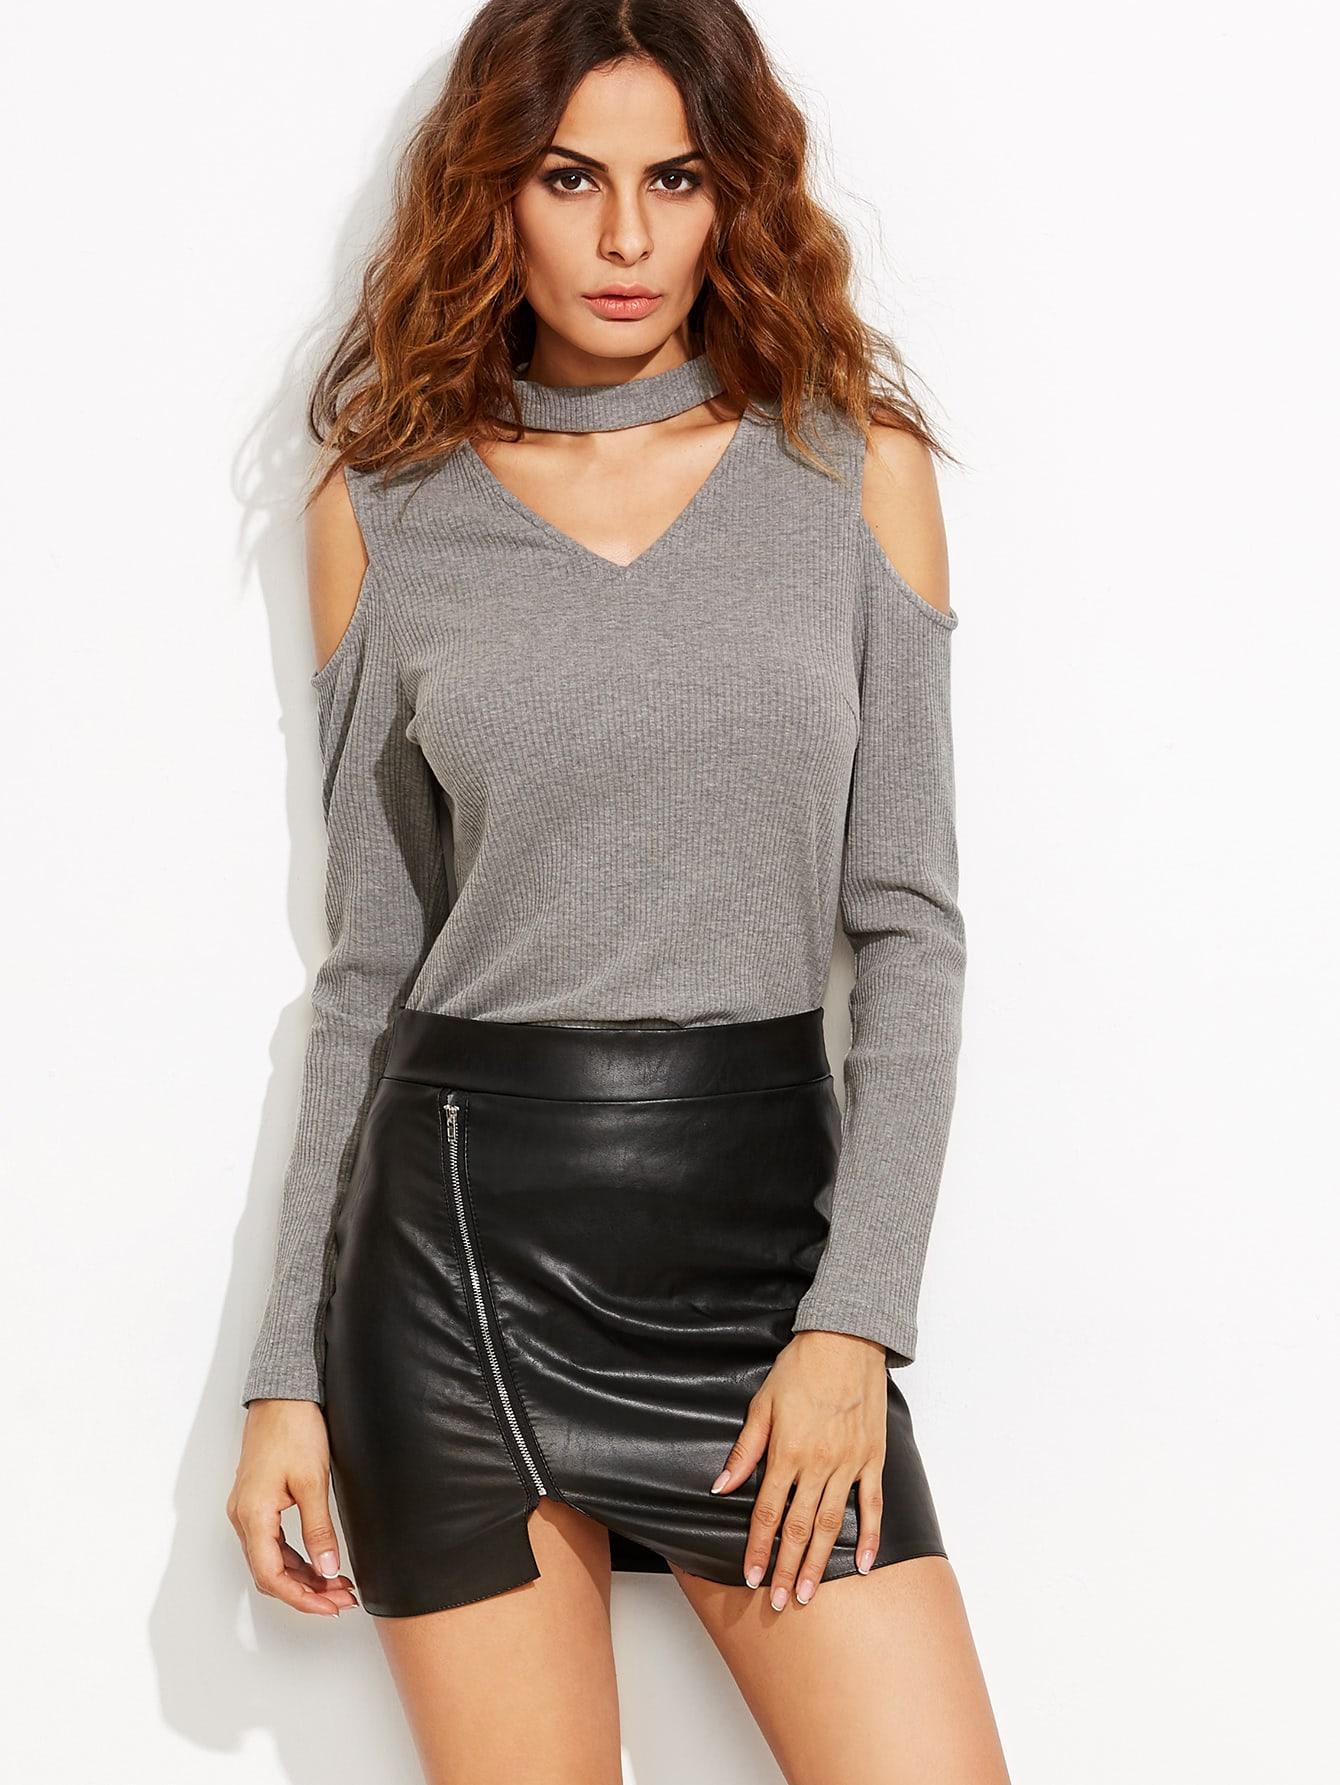 Heather Grey Cutout Choker Open Shoulder Ribbed T-shirt tee160810701